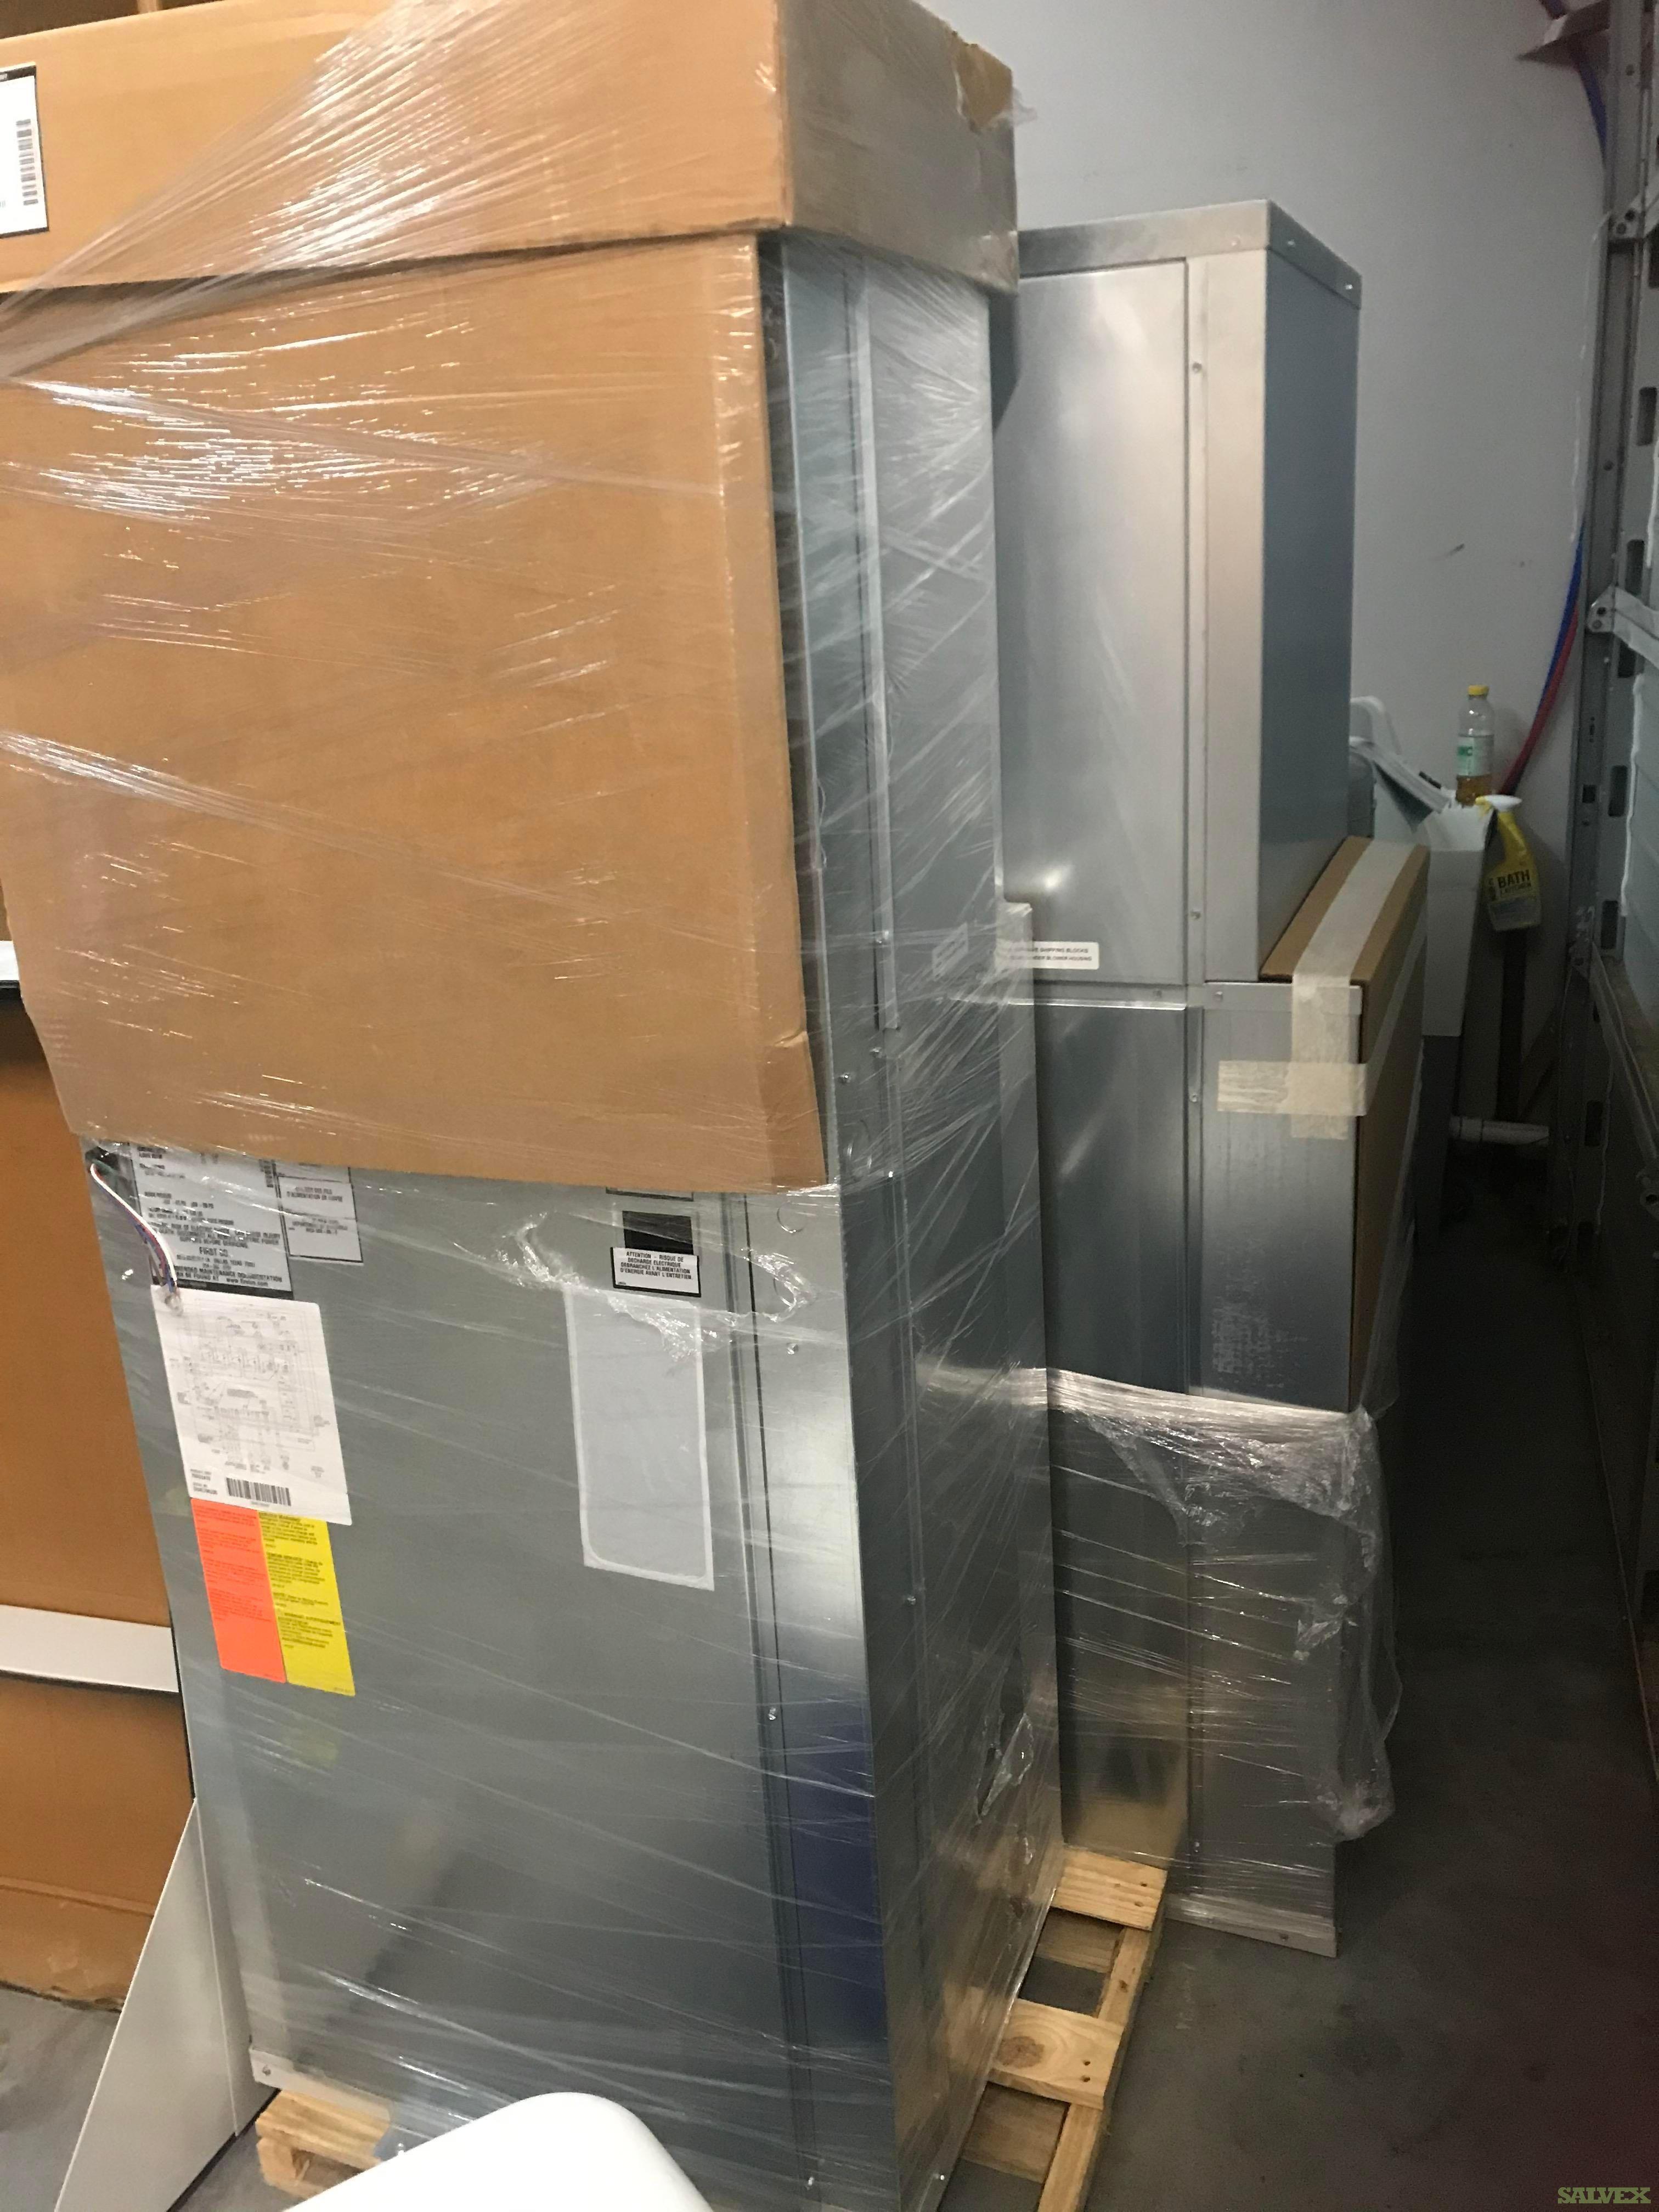 First Co. 75TD2410 24SPXC10-HP Heat Pump 10Kw 240V- New (3 Units)